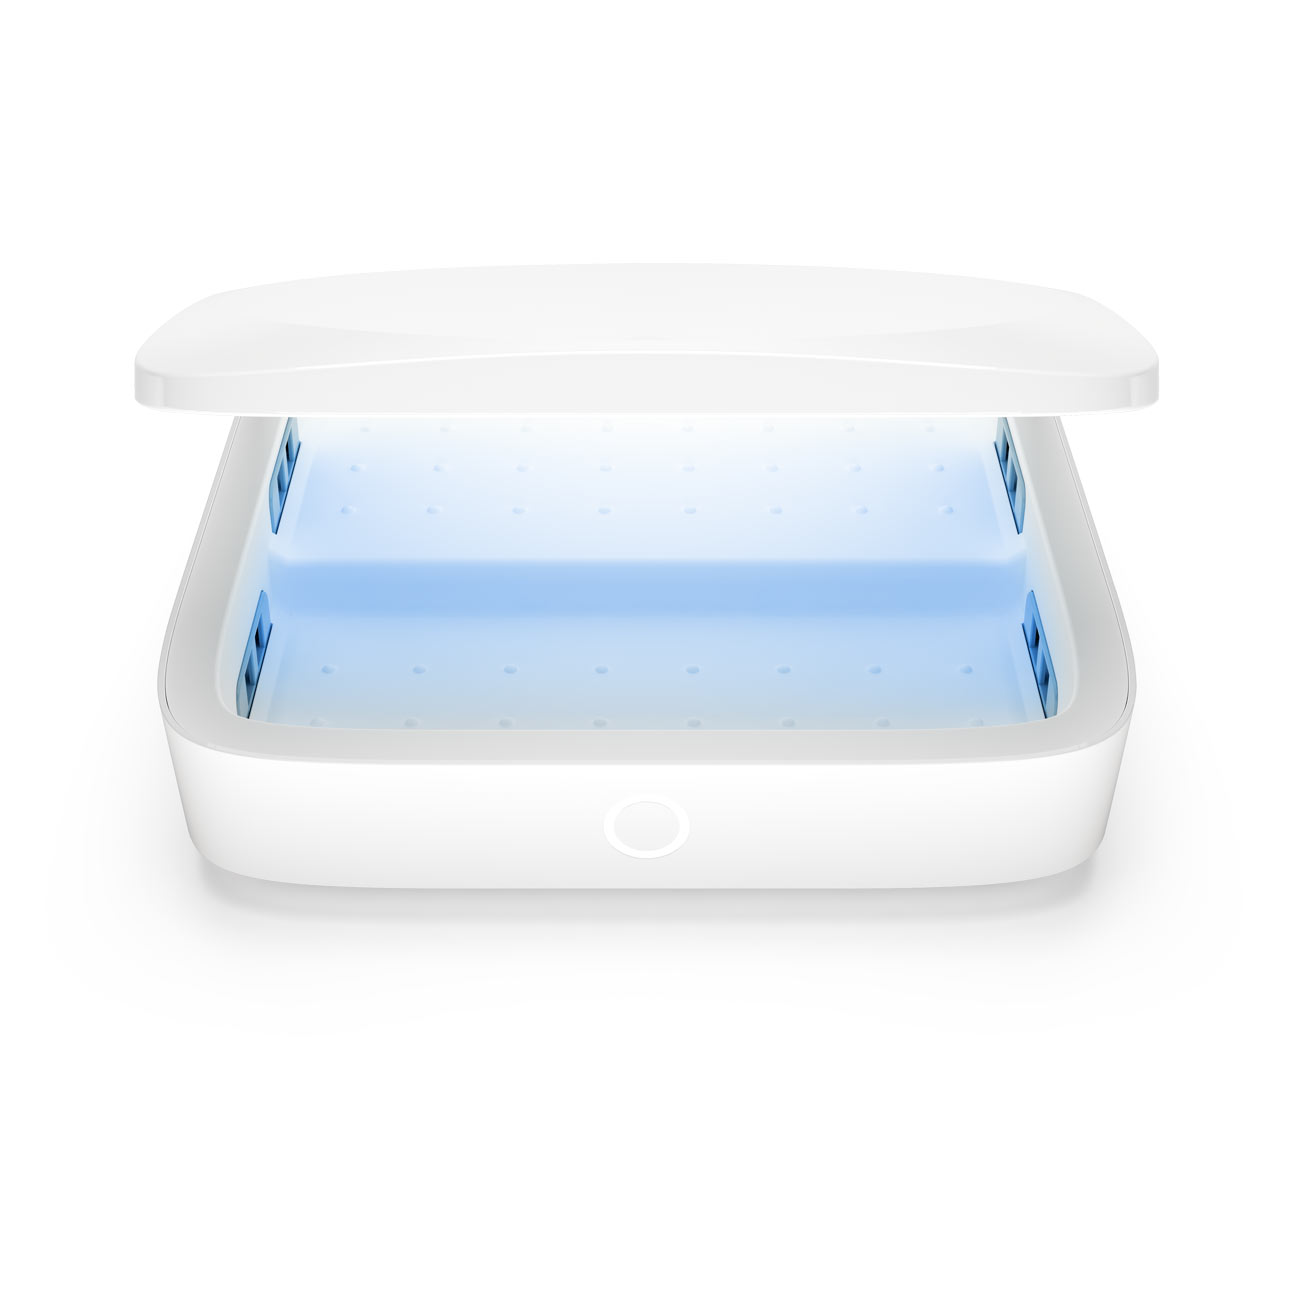 Mundus UV Pro Wireless Charger - Einova